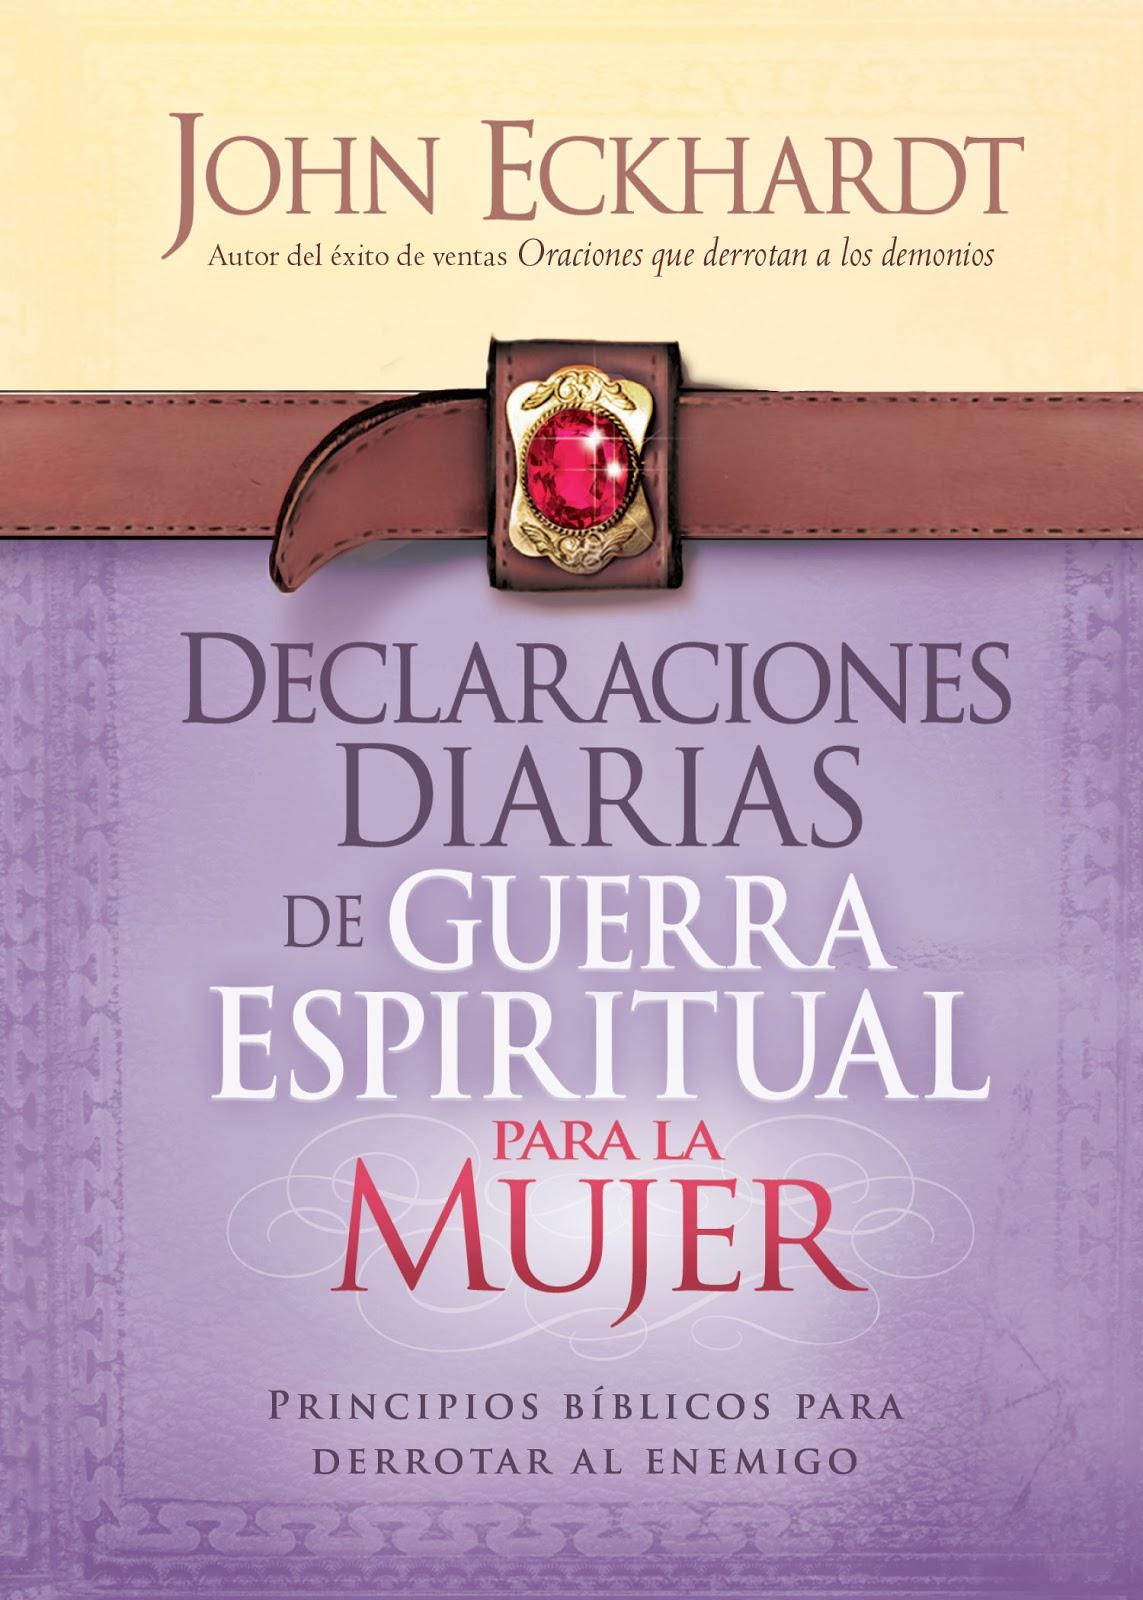 Mar De Vida Abundante: LIBROS CRISTIANOS GRATIS ONLINE  @tataya.com.mx